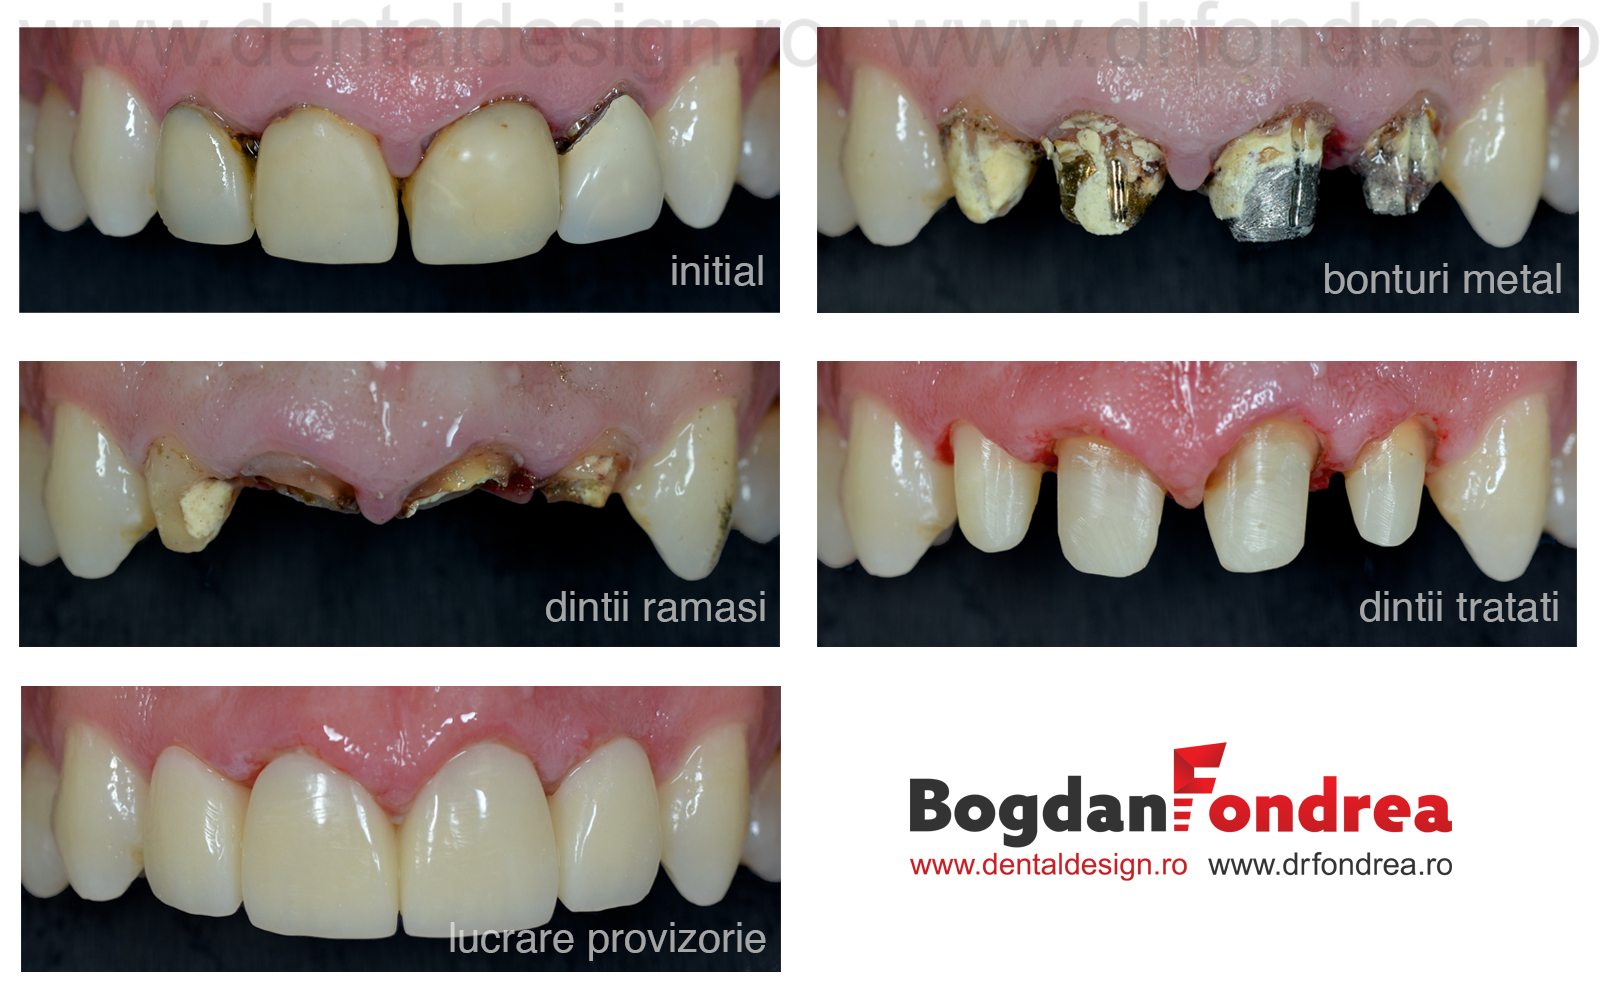 tratament canal endodontie timisoara